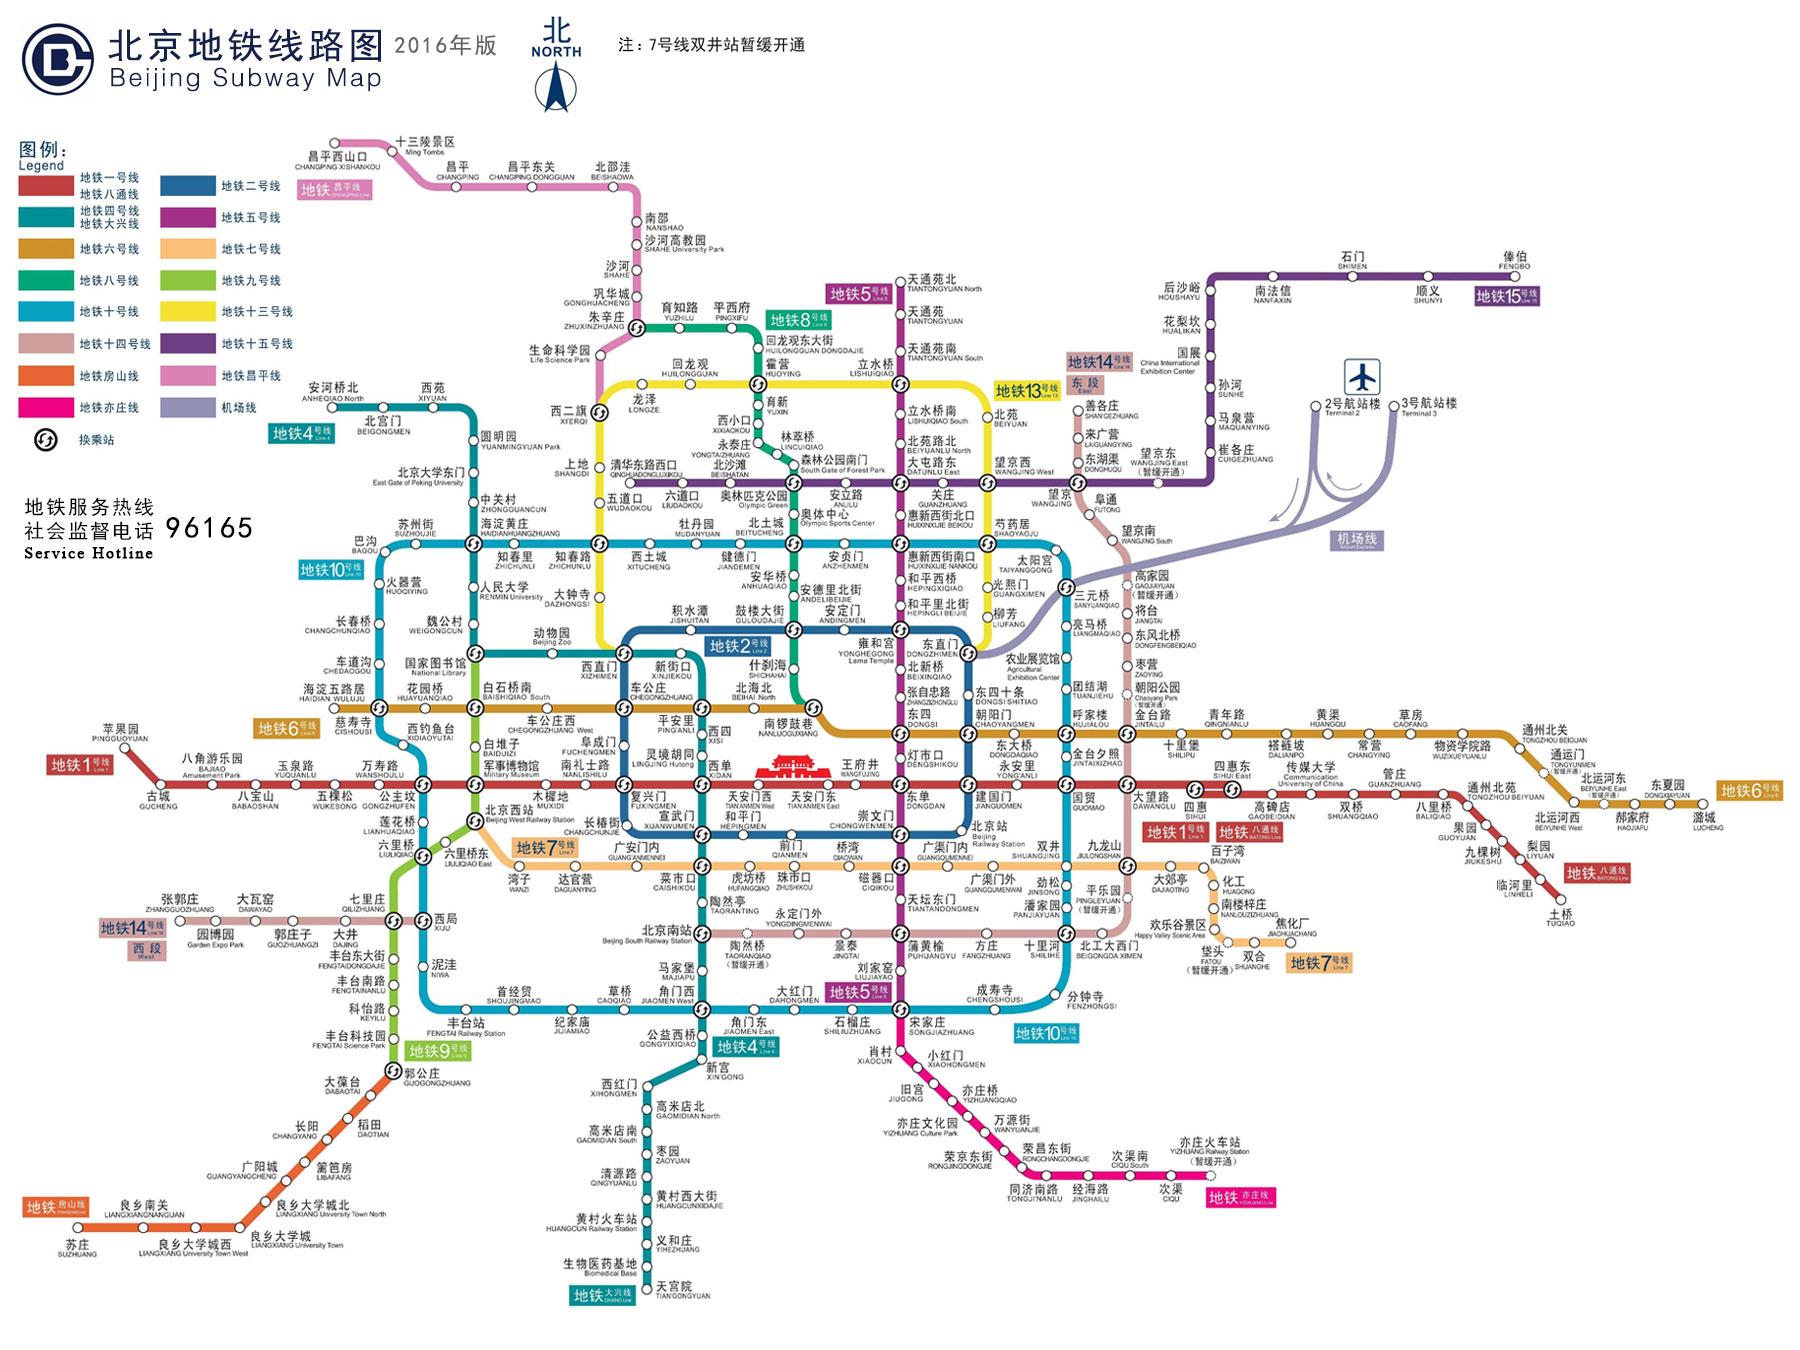 Схема пекинского метро